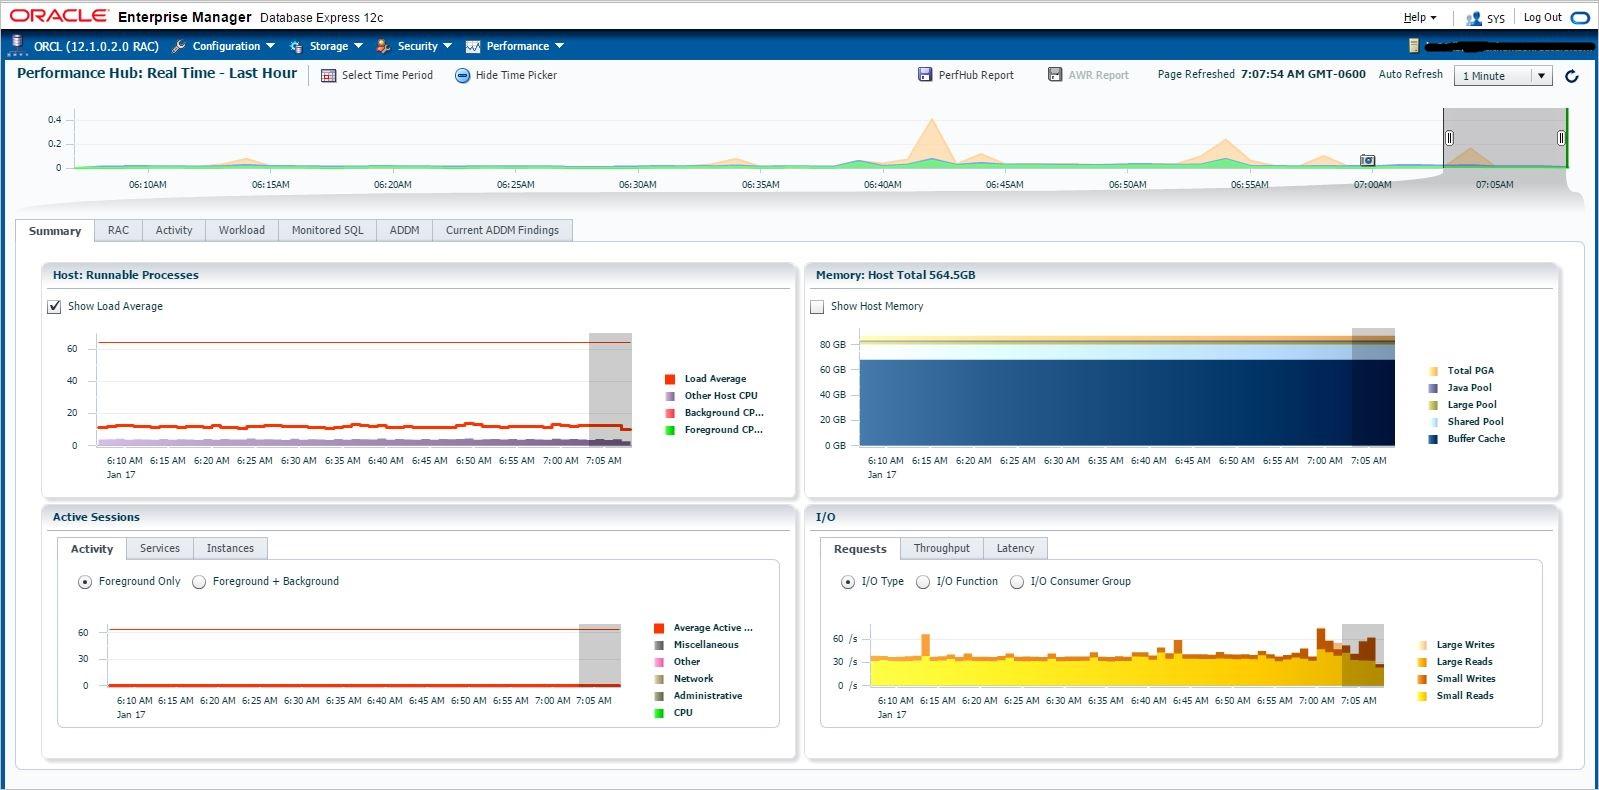 Netsoftmate Technical Blog : Oracle Enterprise Manager Database Express 12c - EM Express